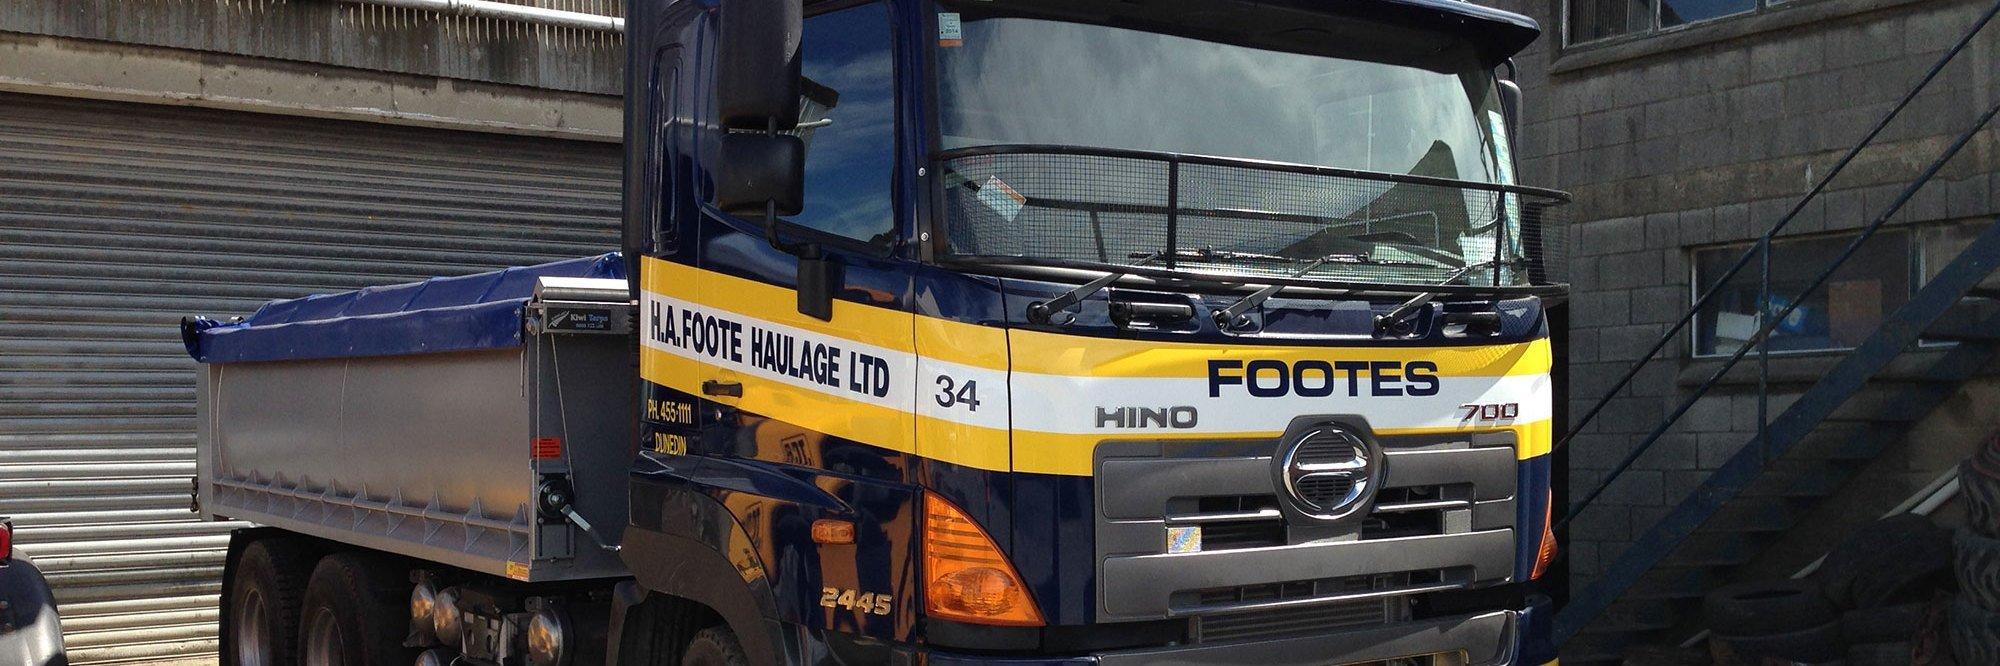 Trucks providing haulage for a timber company in Dunedin